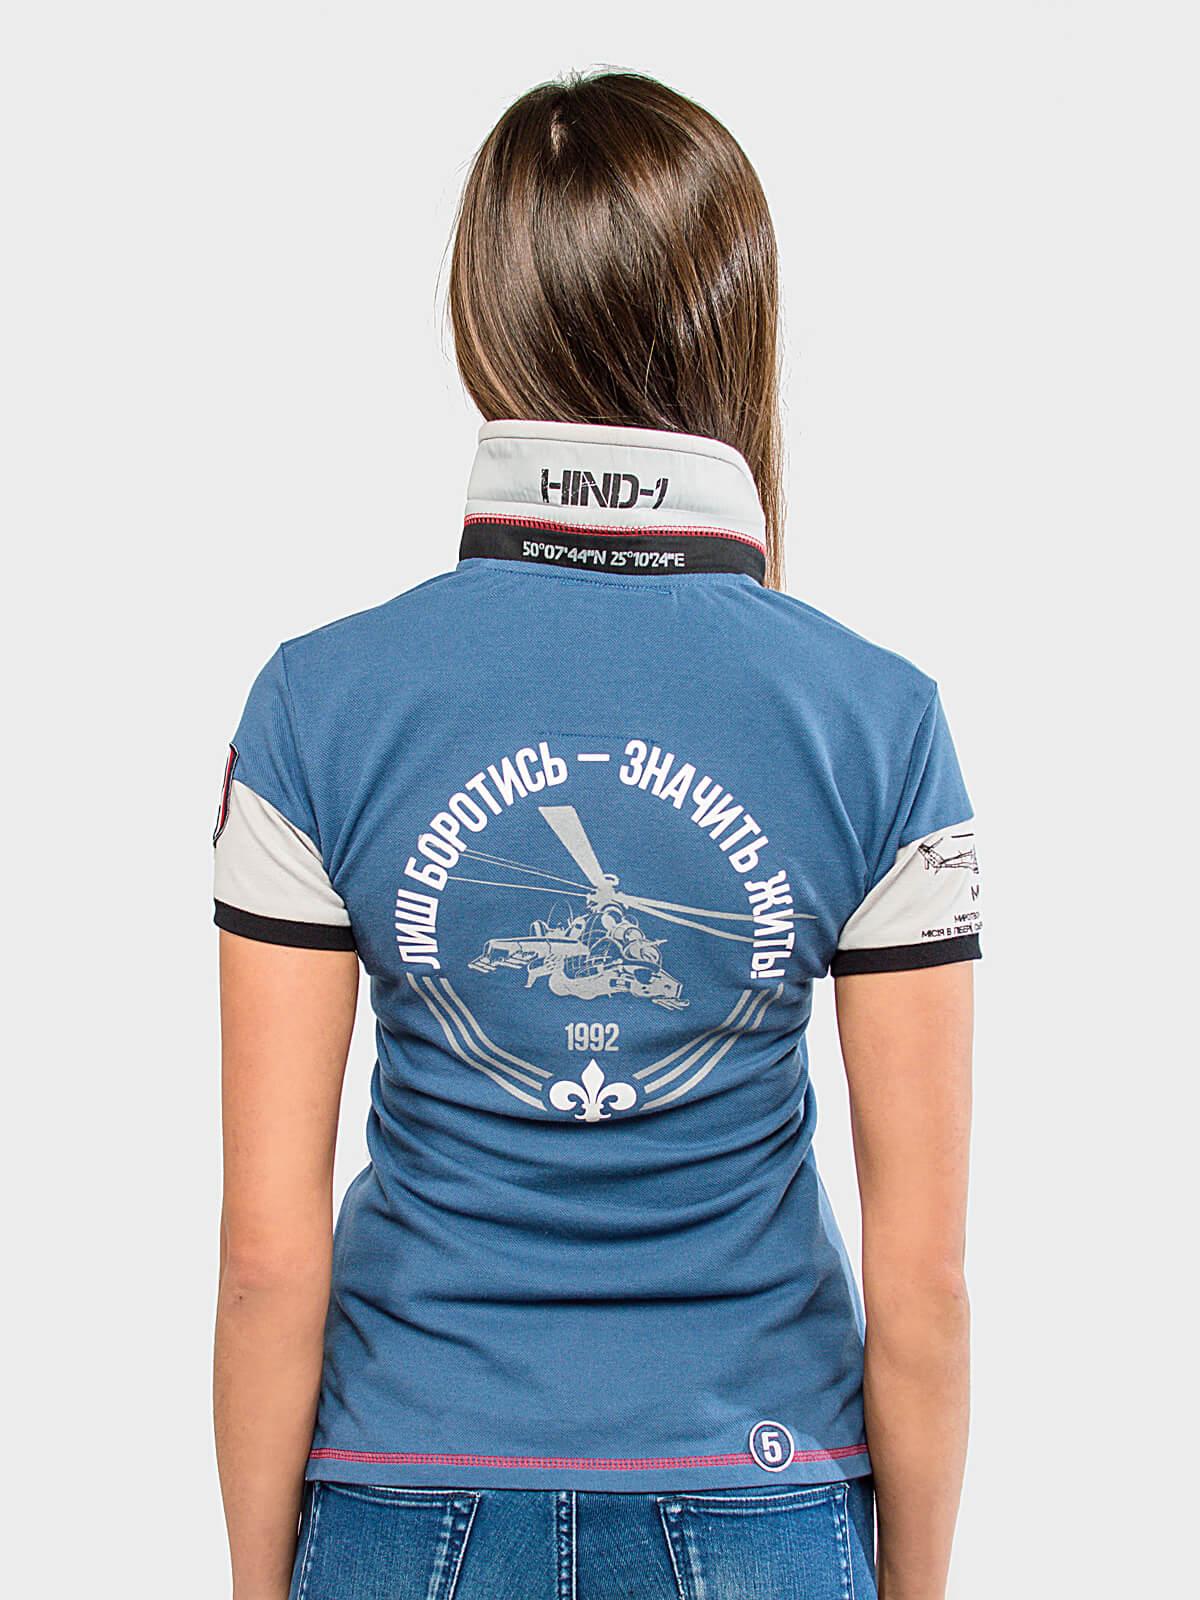 Women's Polo Shirt 16 Brigade. Color denim.  Тканина піке: 100% бавовна.